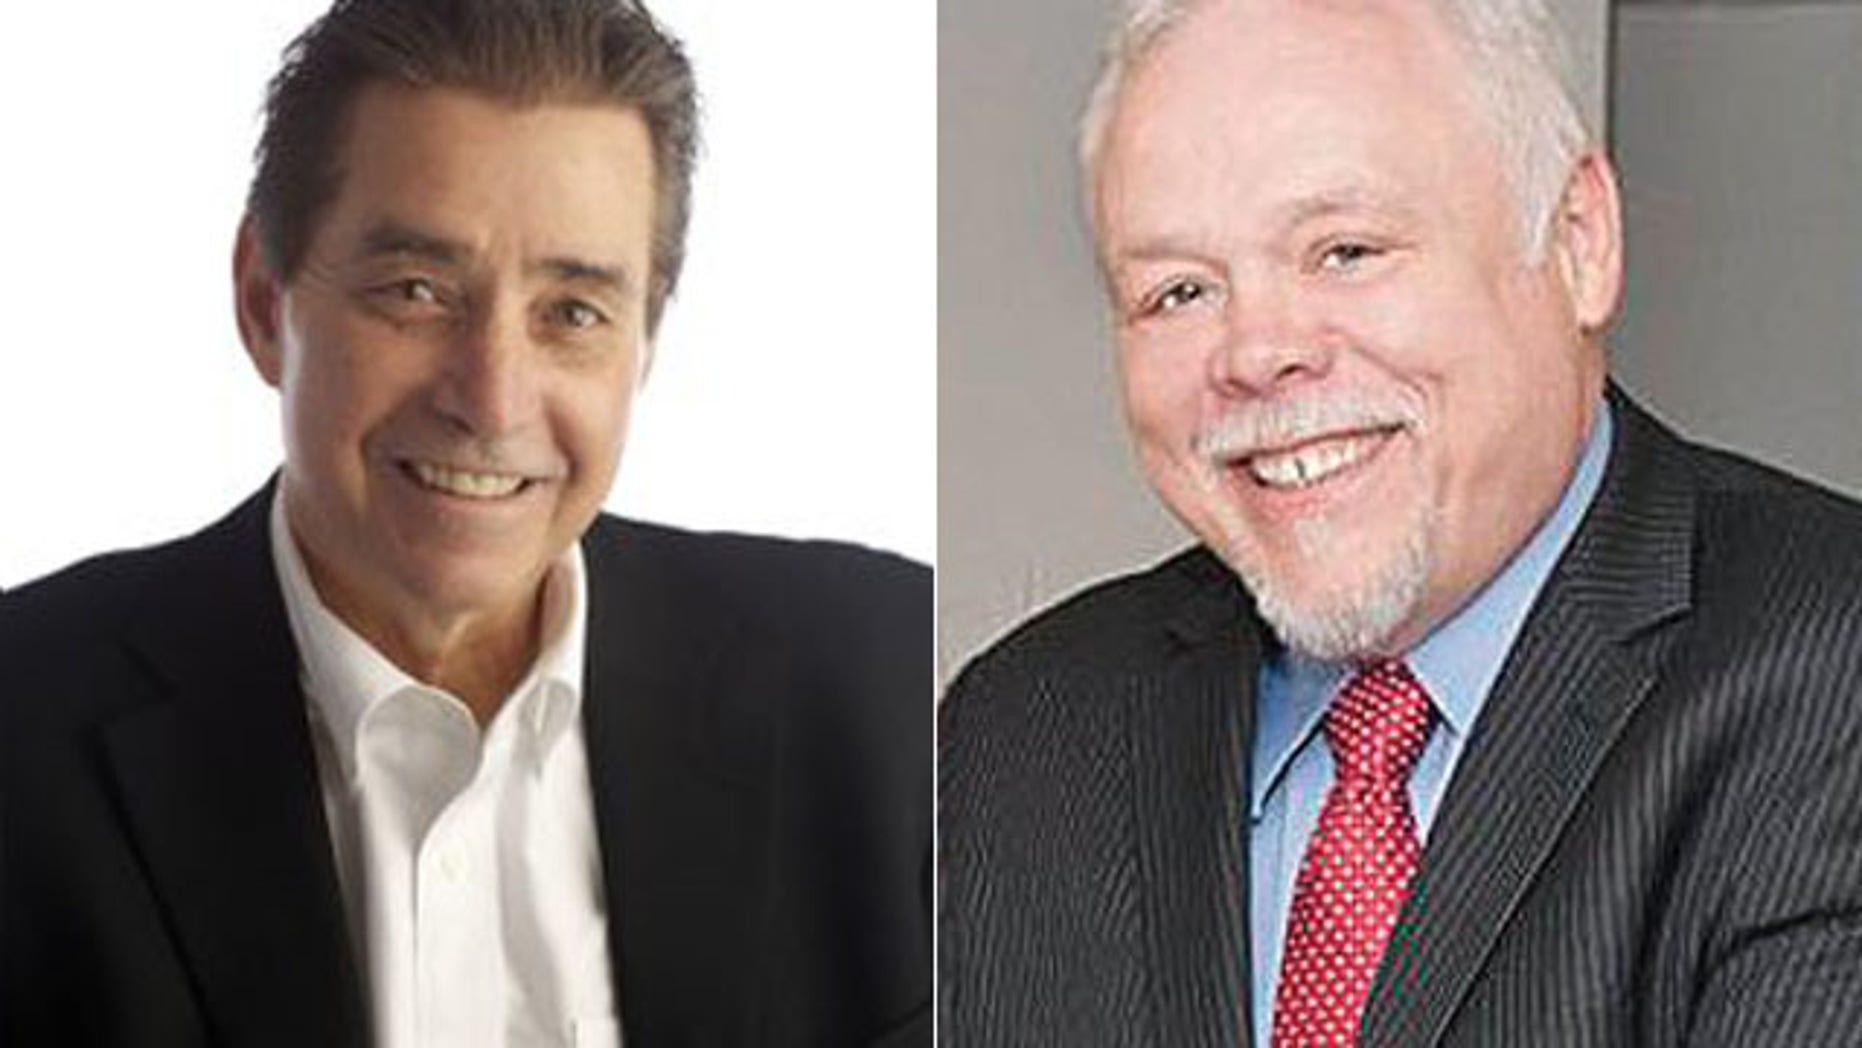 The editor of The Columbian Lou Brancaccio, left, and state Sen. Don Benton.